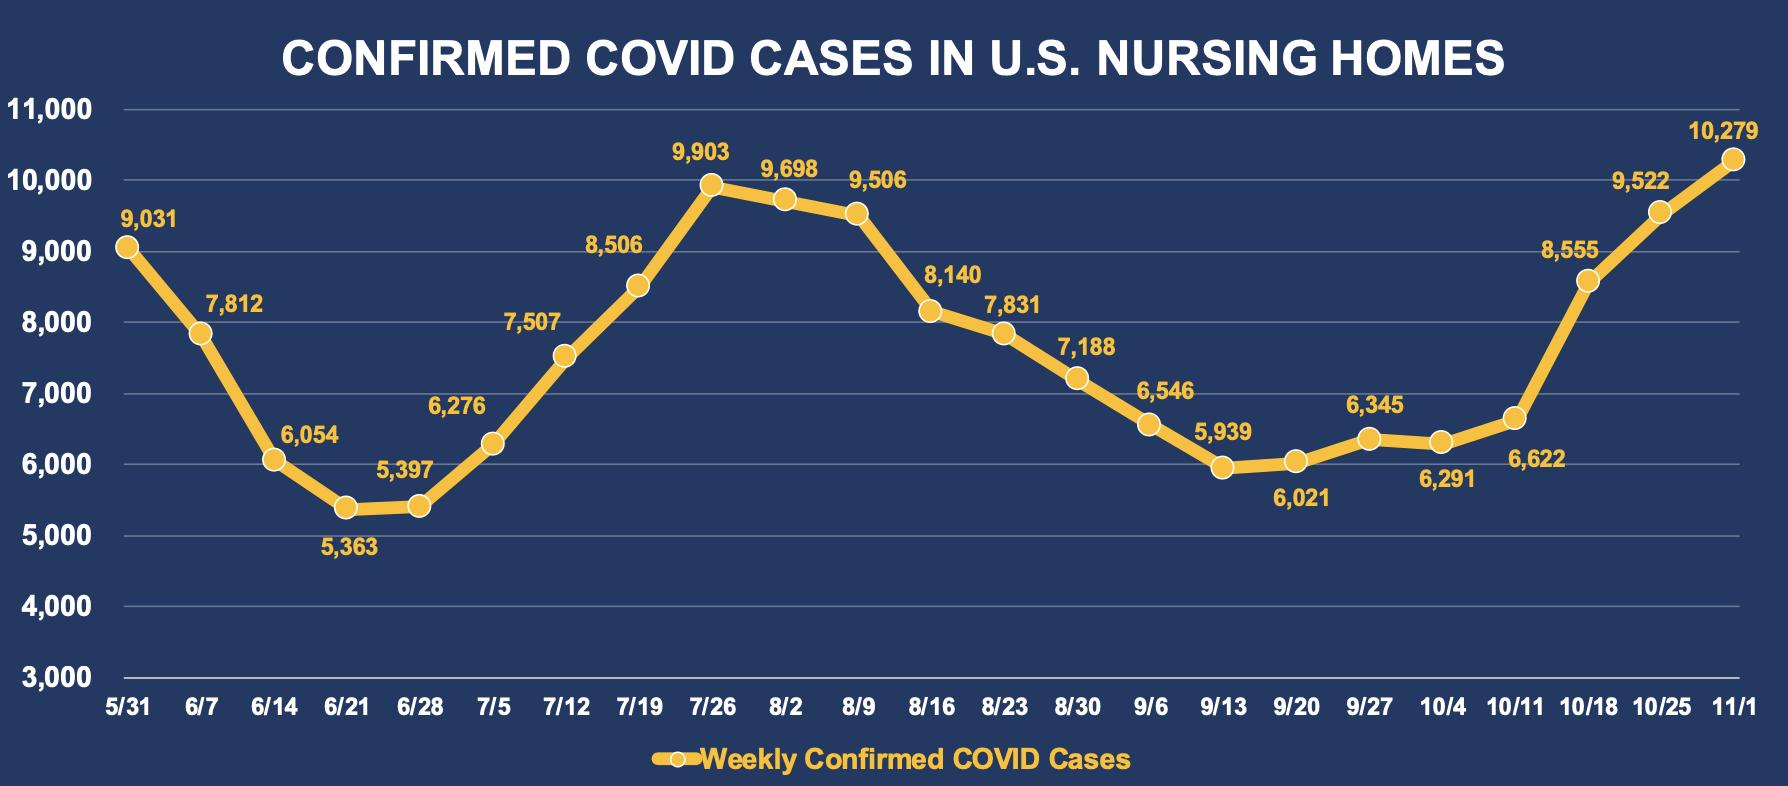 Confirmed COVID Cases In U.S. Nursing Homes